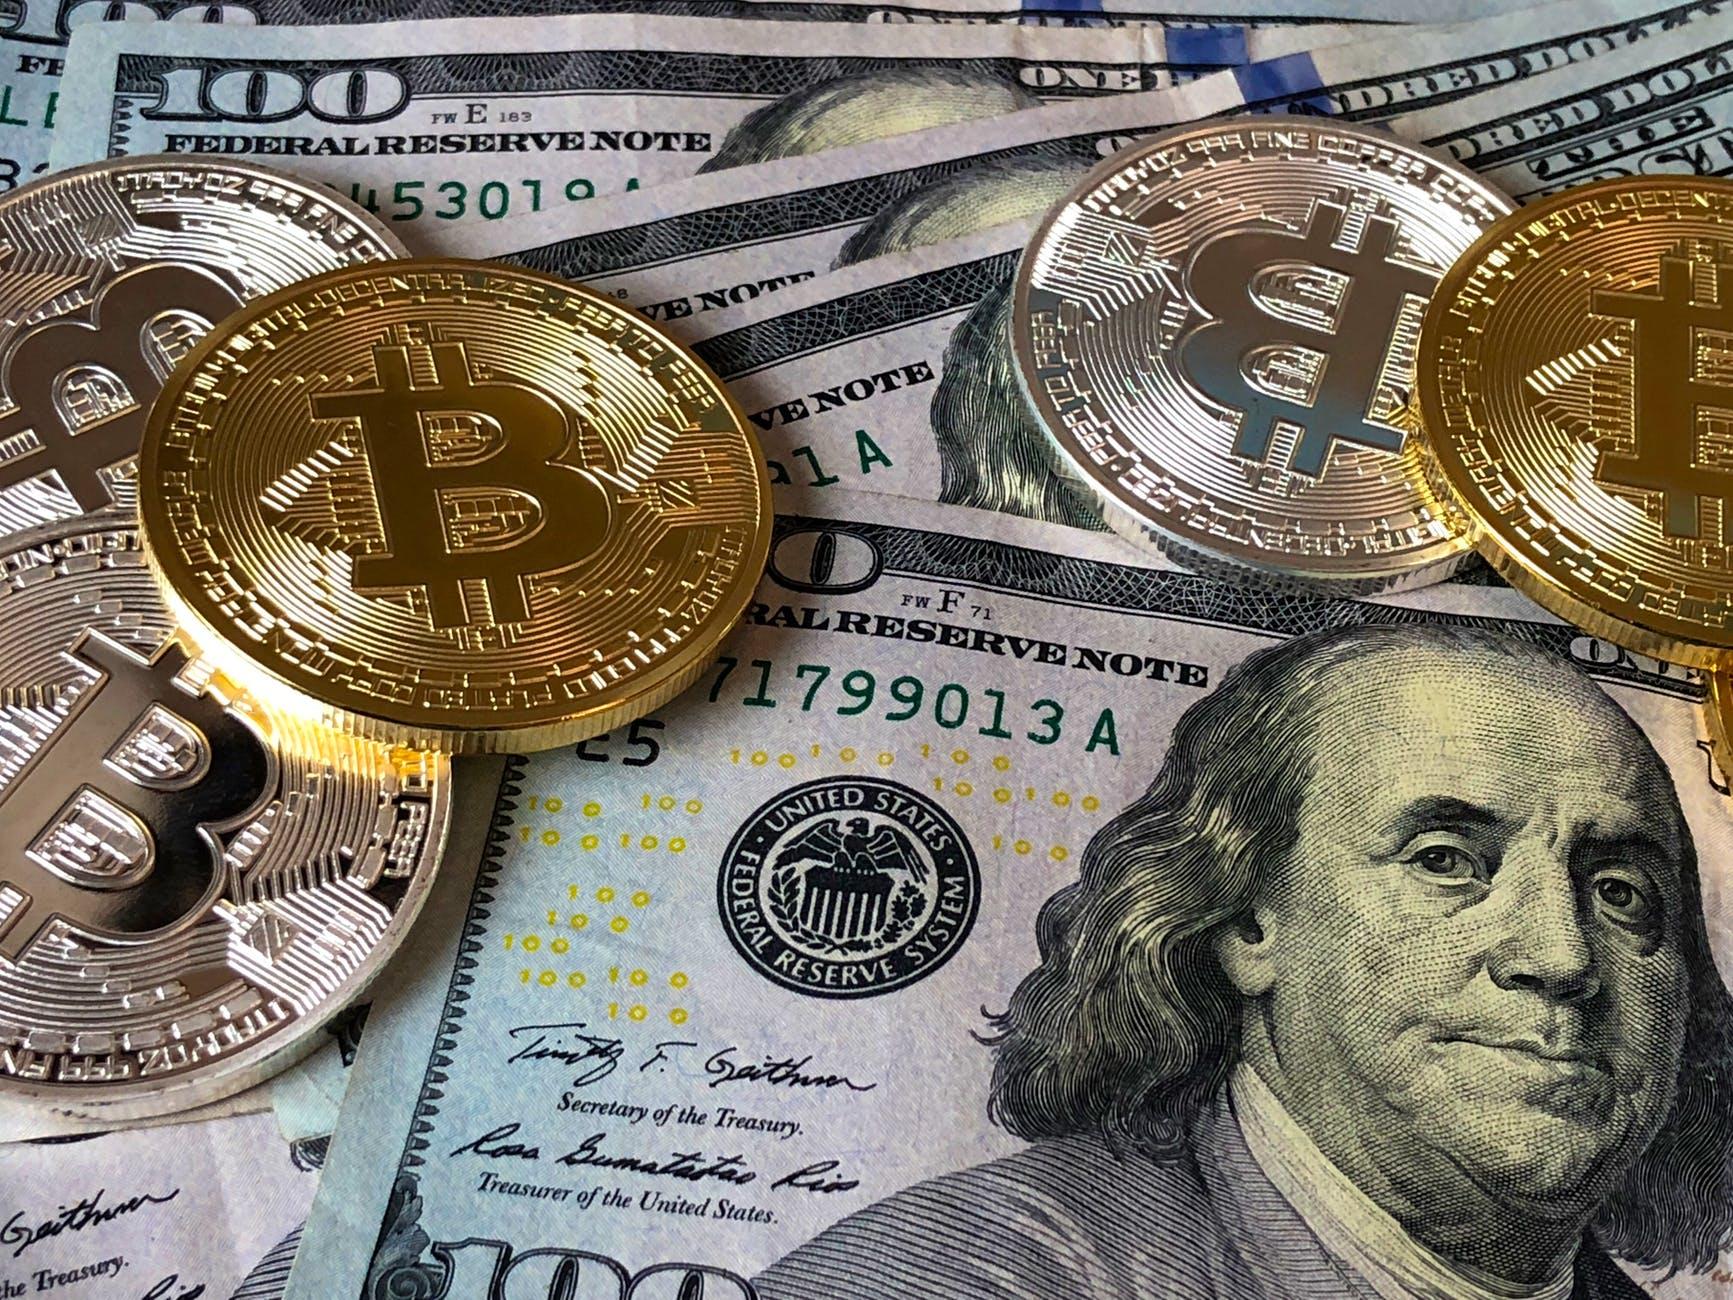 bitcoins digitali and u s dollar bills